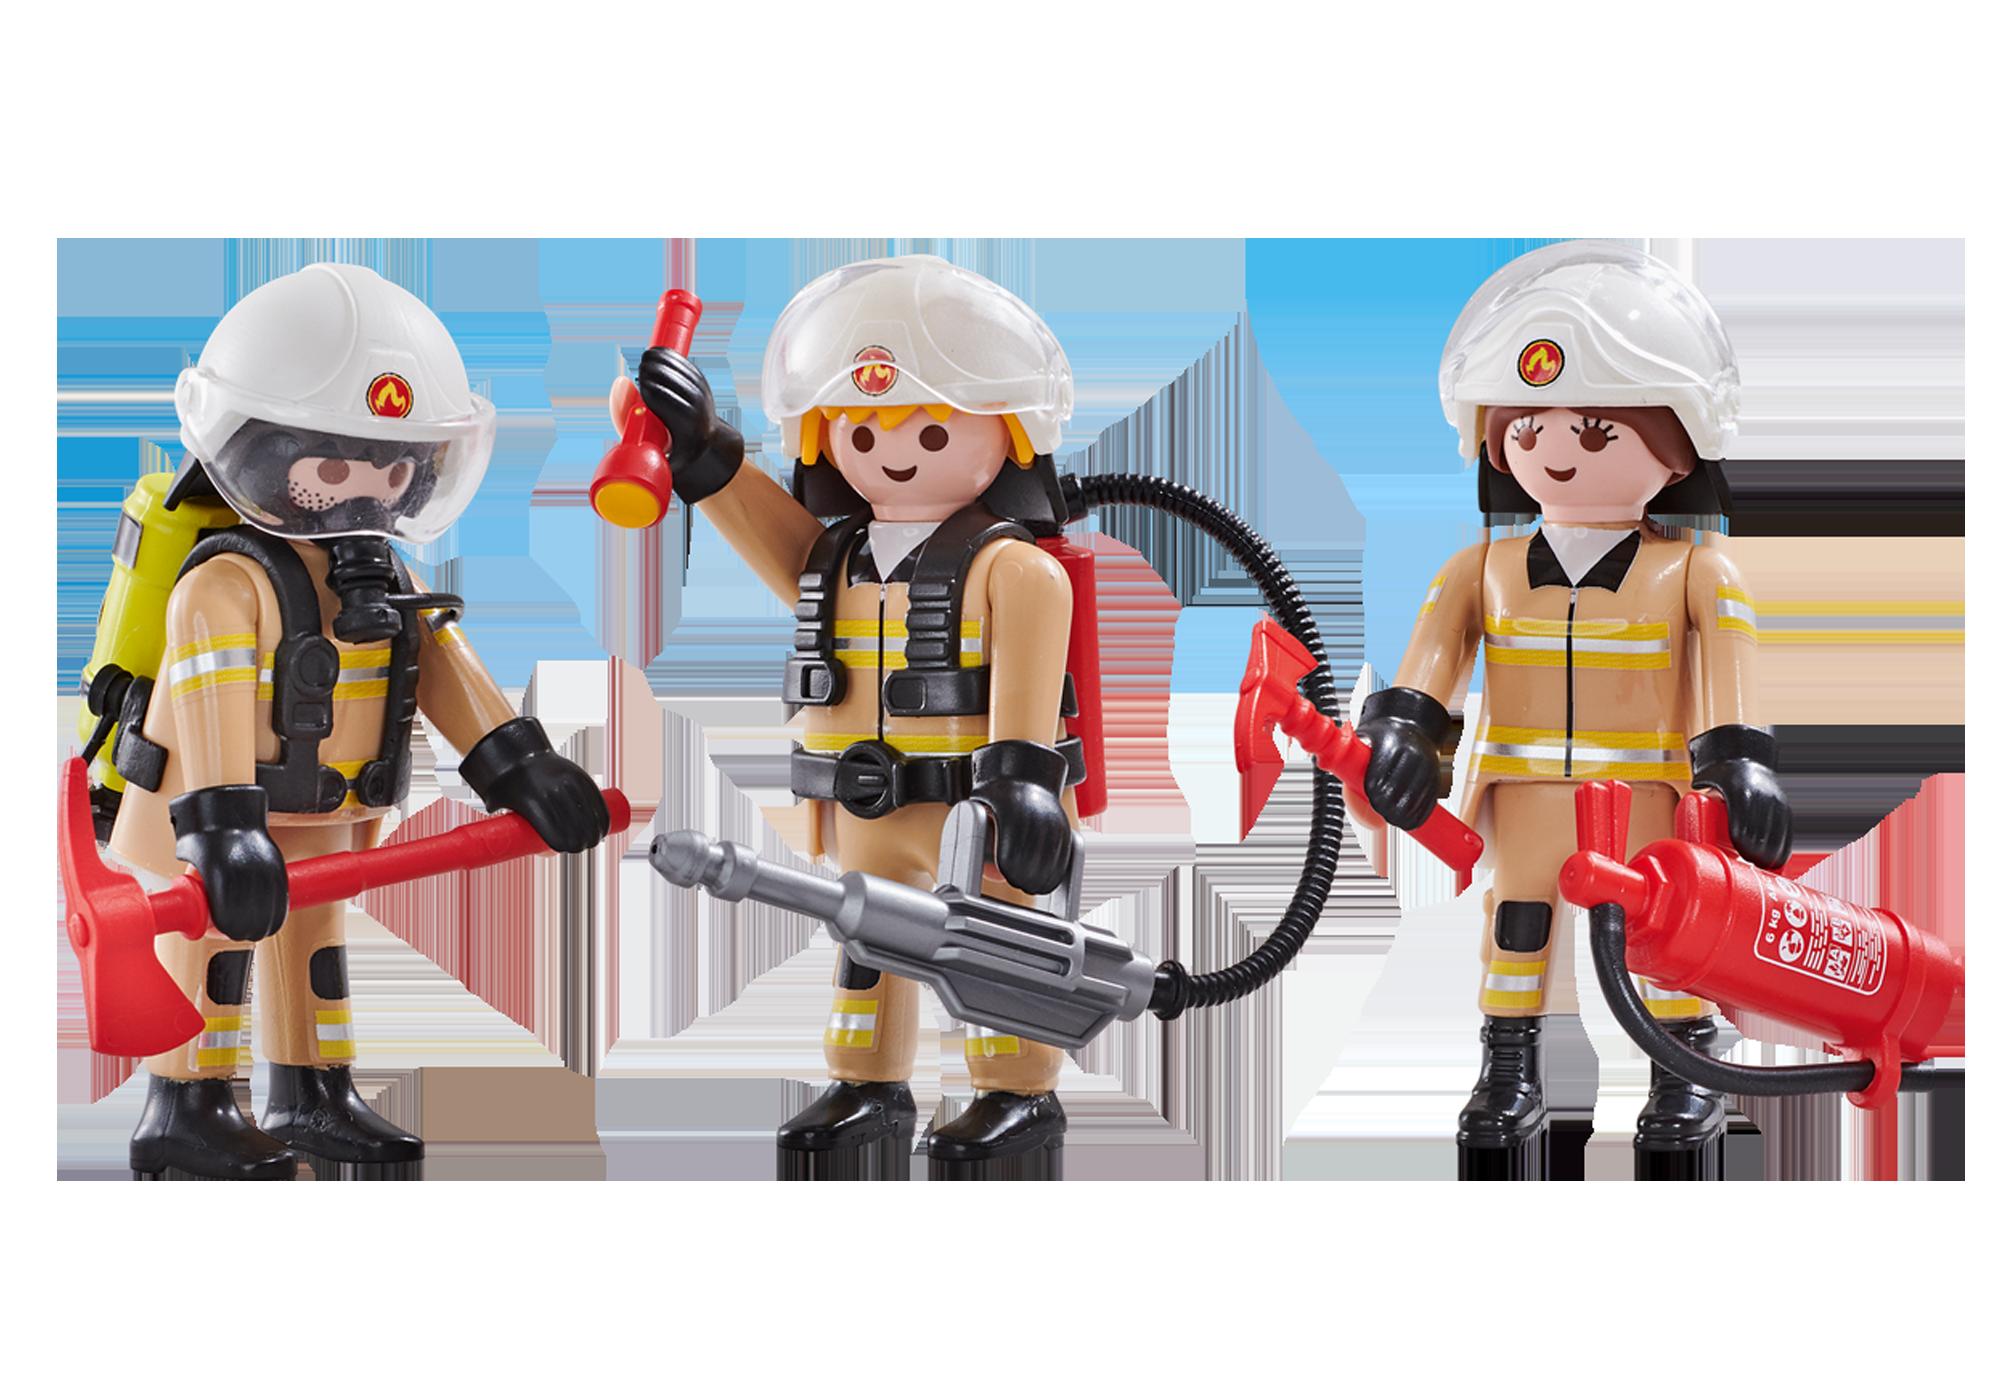 http://media.playmobil.com/i/playmobil/6584_product_detail/3 brandweerlieden ploeg A